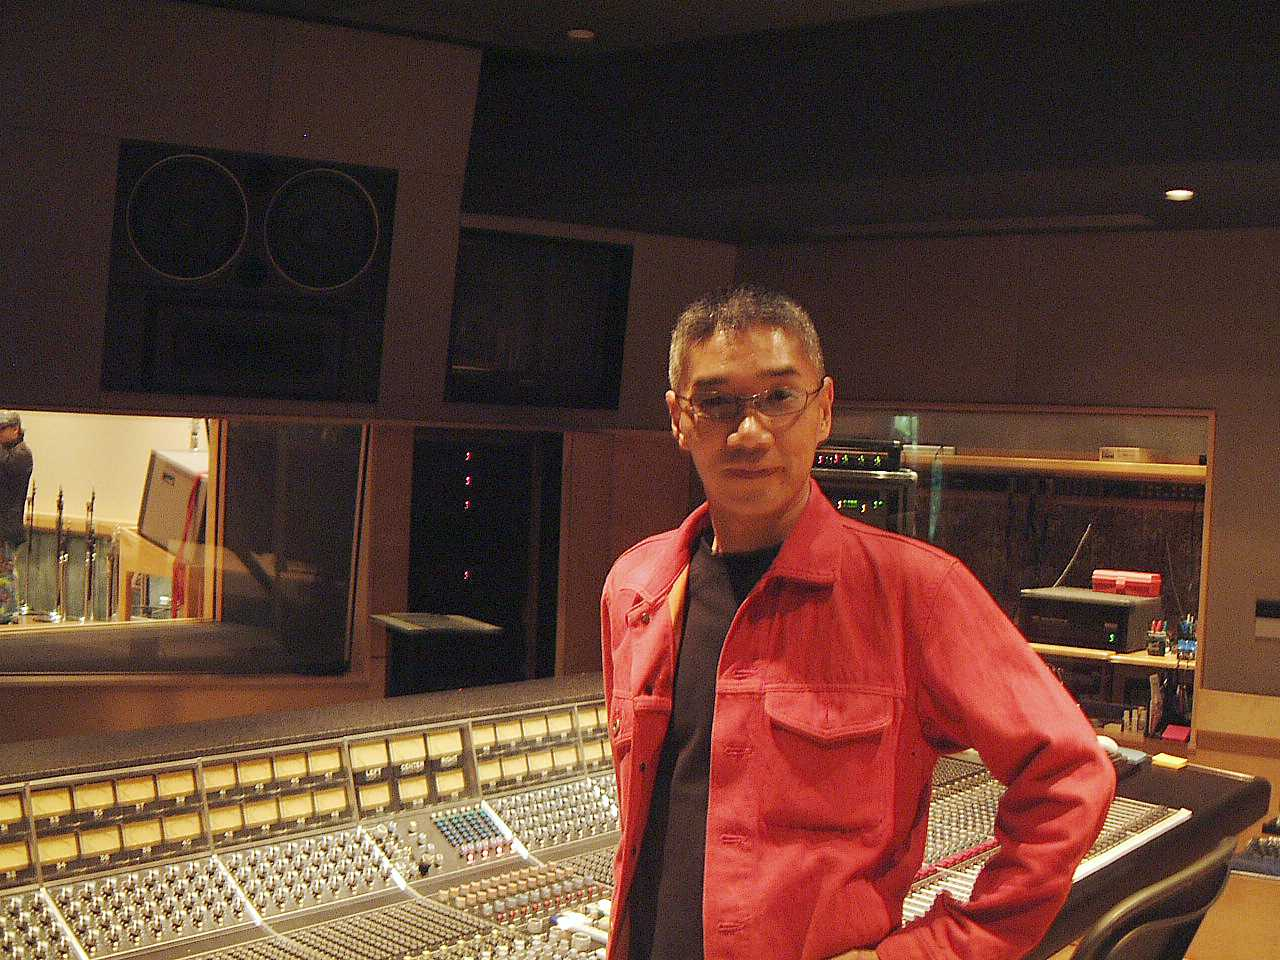 Music & Video Games: David Wise